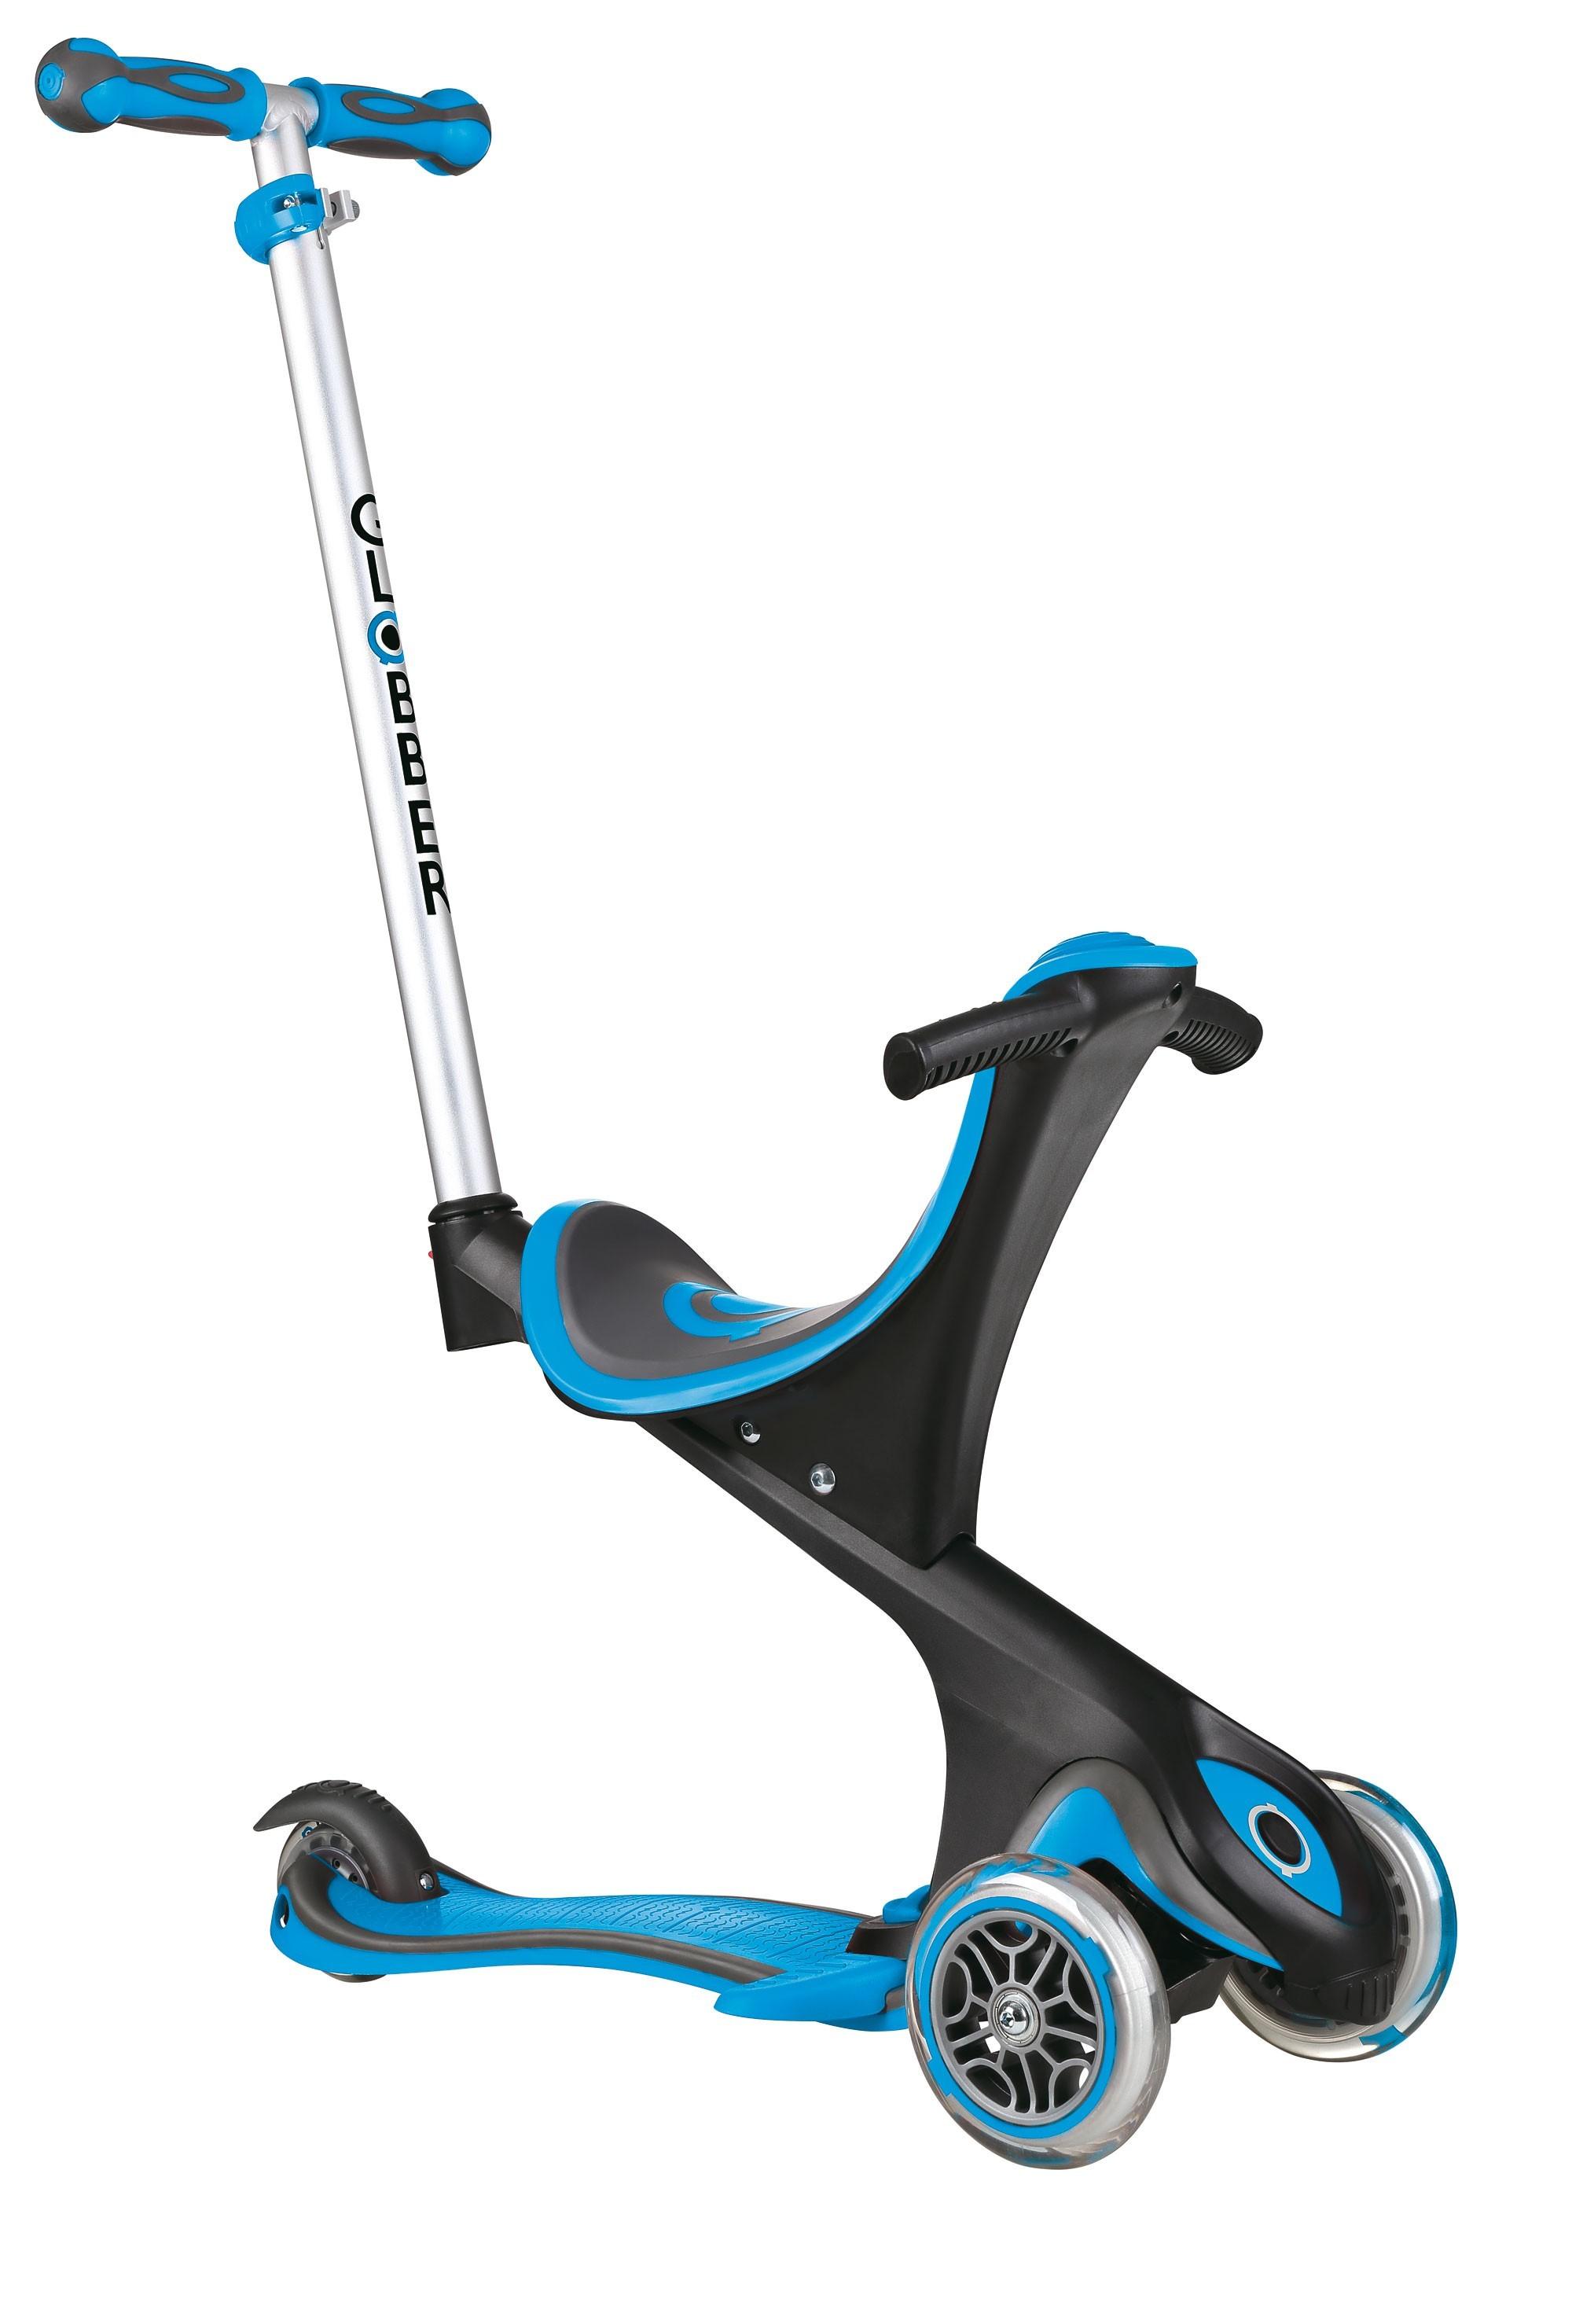 Scooter Kinderroller Dreirad Laufrad Globber Evo Comfort 5in1 himmelbl Bild 5